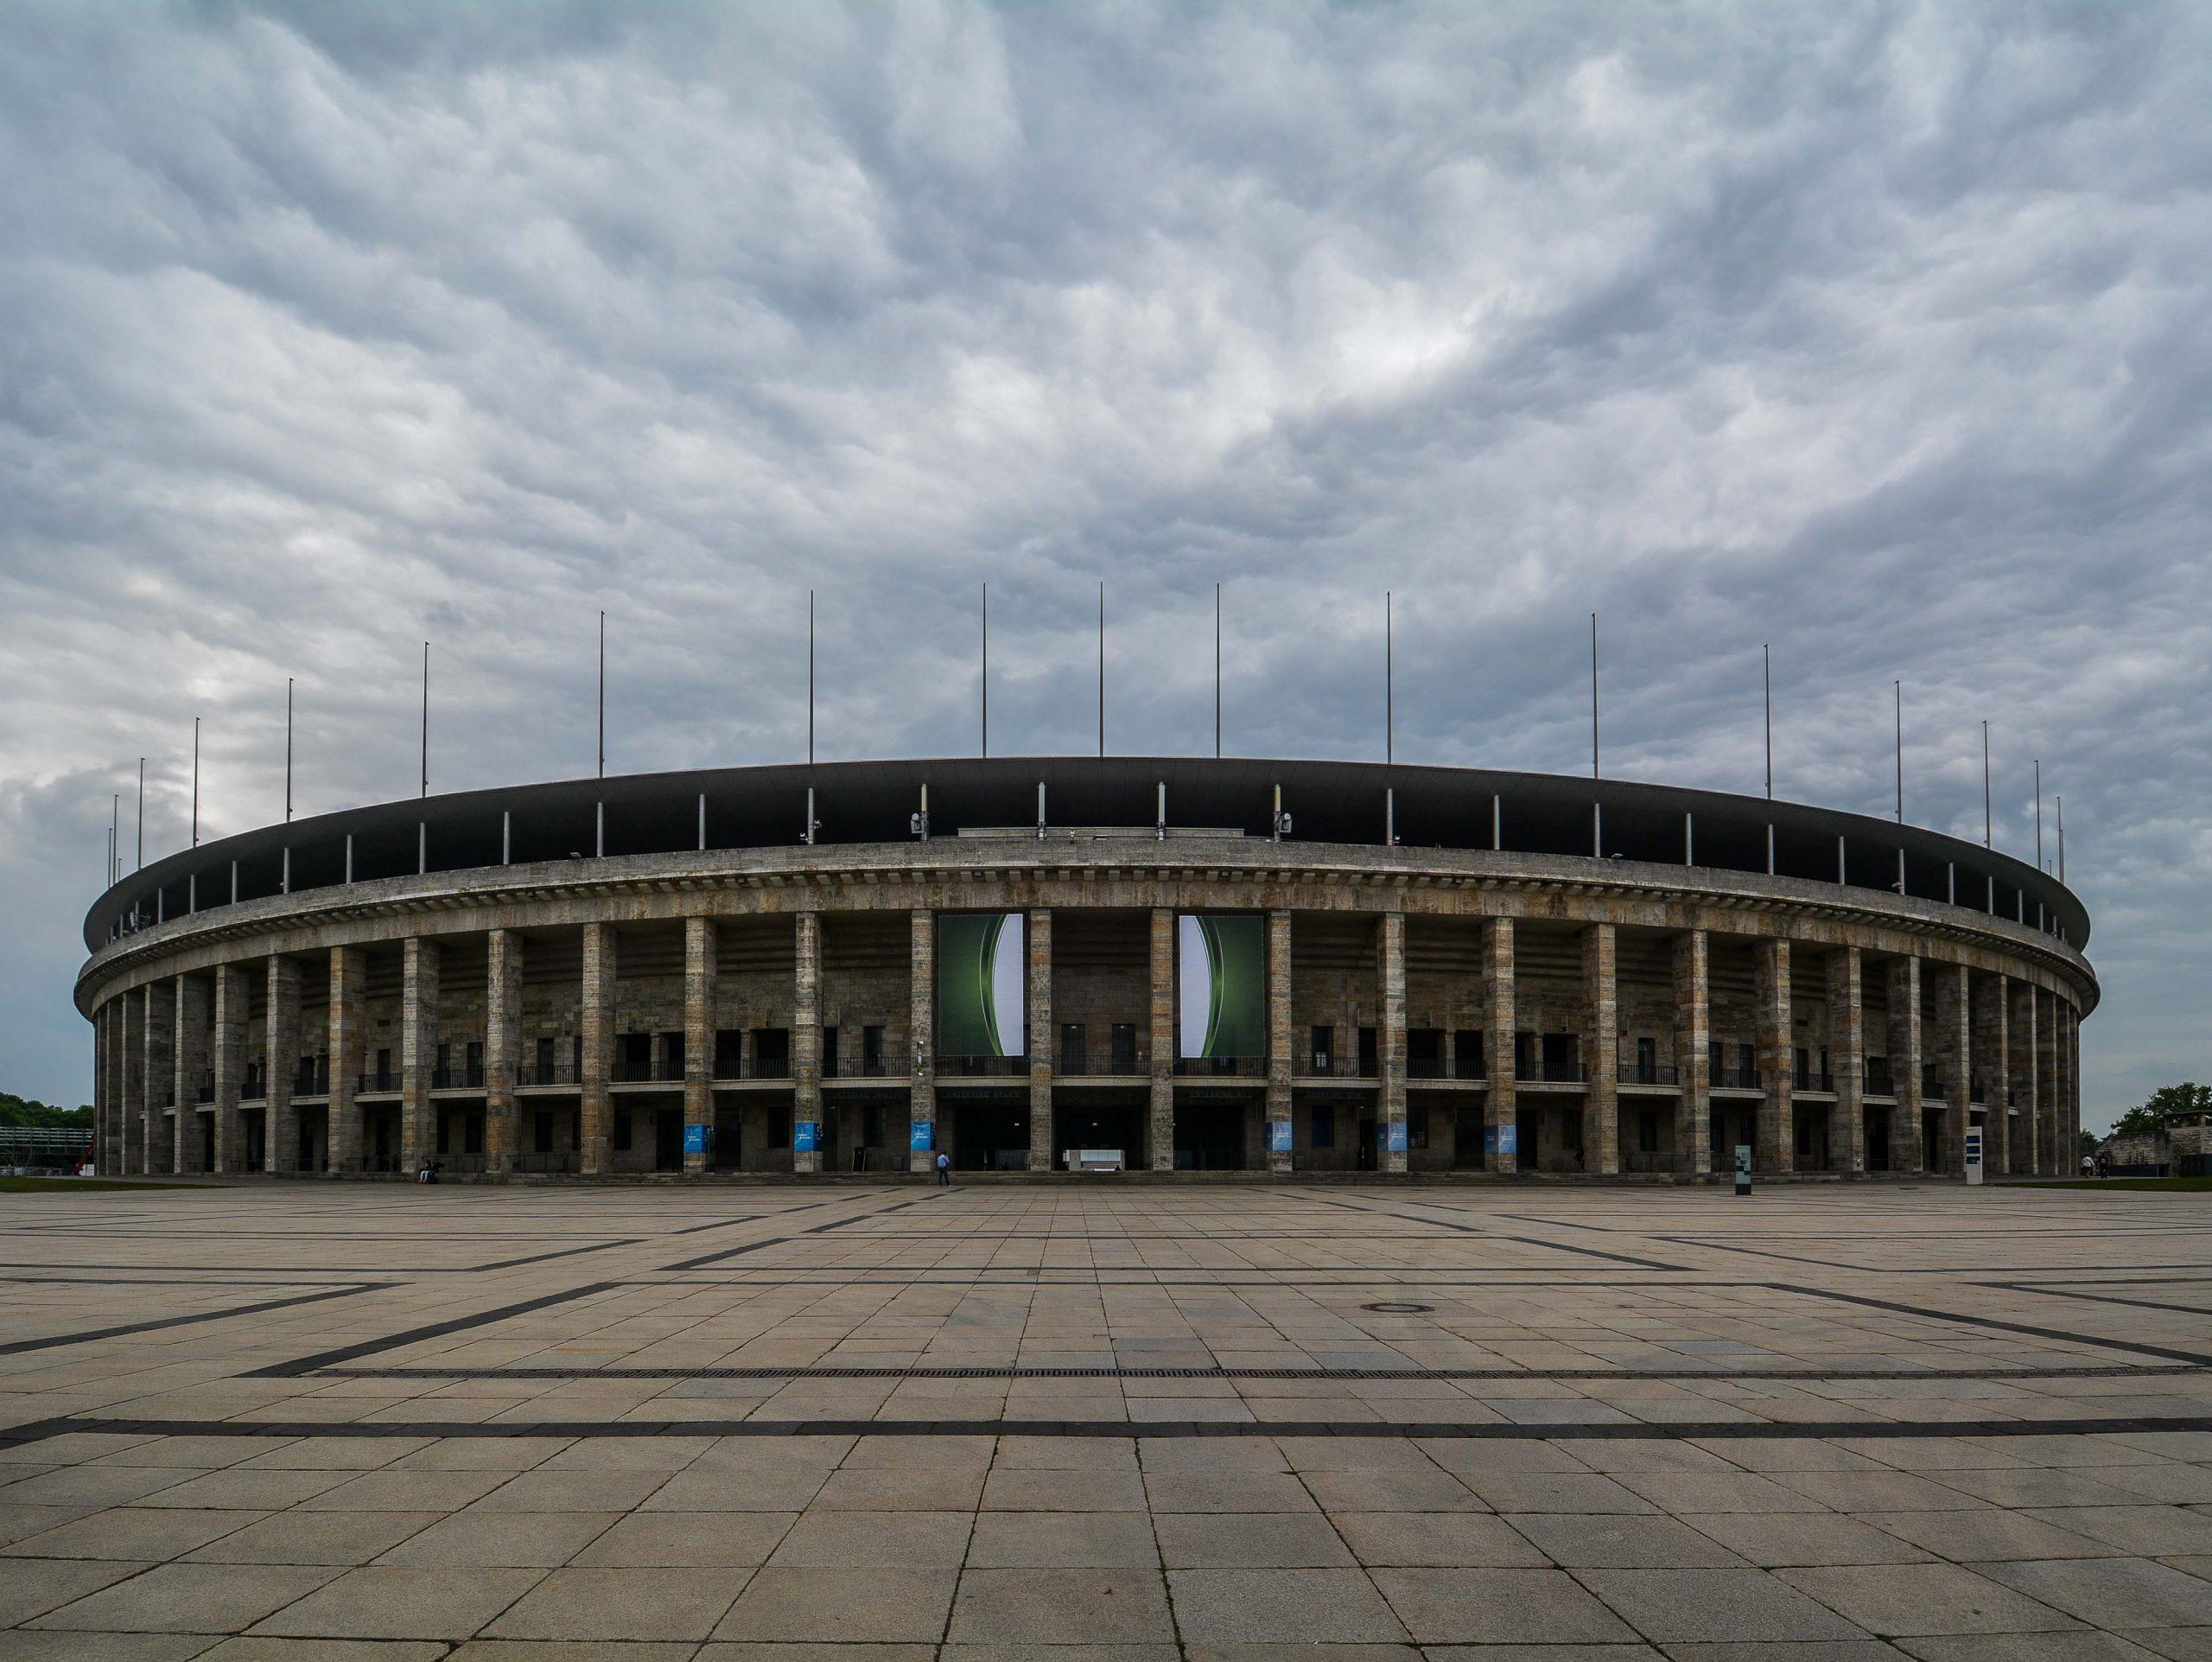 berlin olympia stadion 1936 olympic stadium